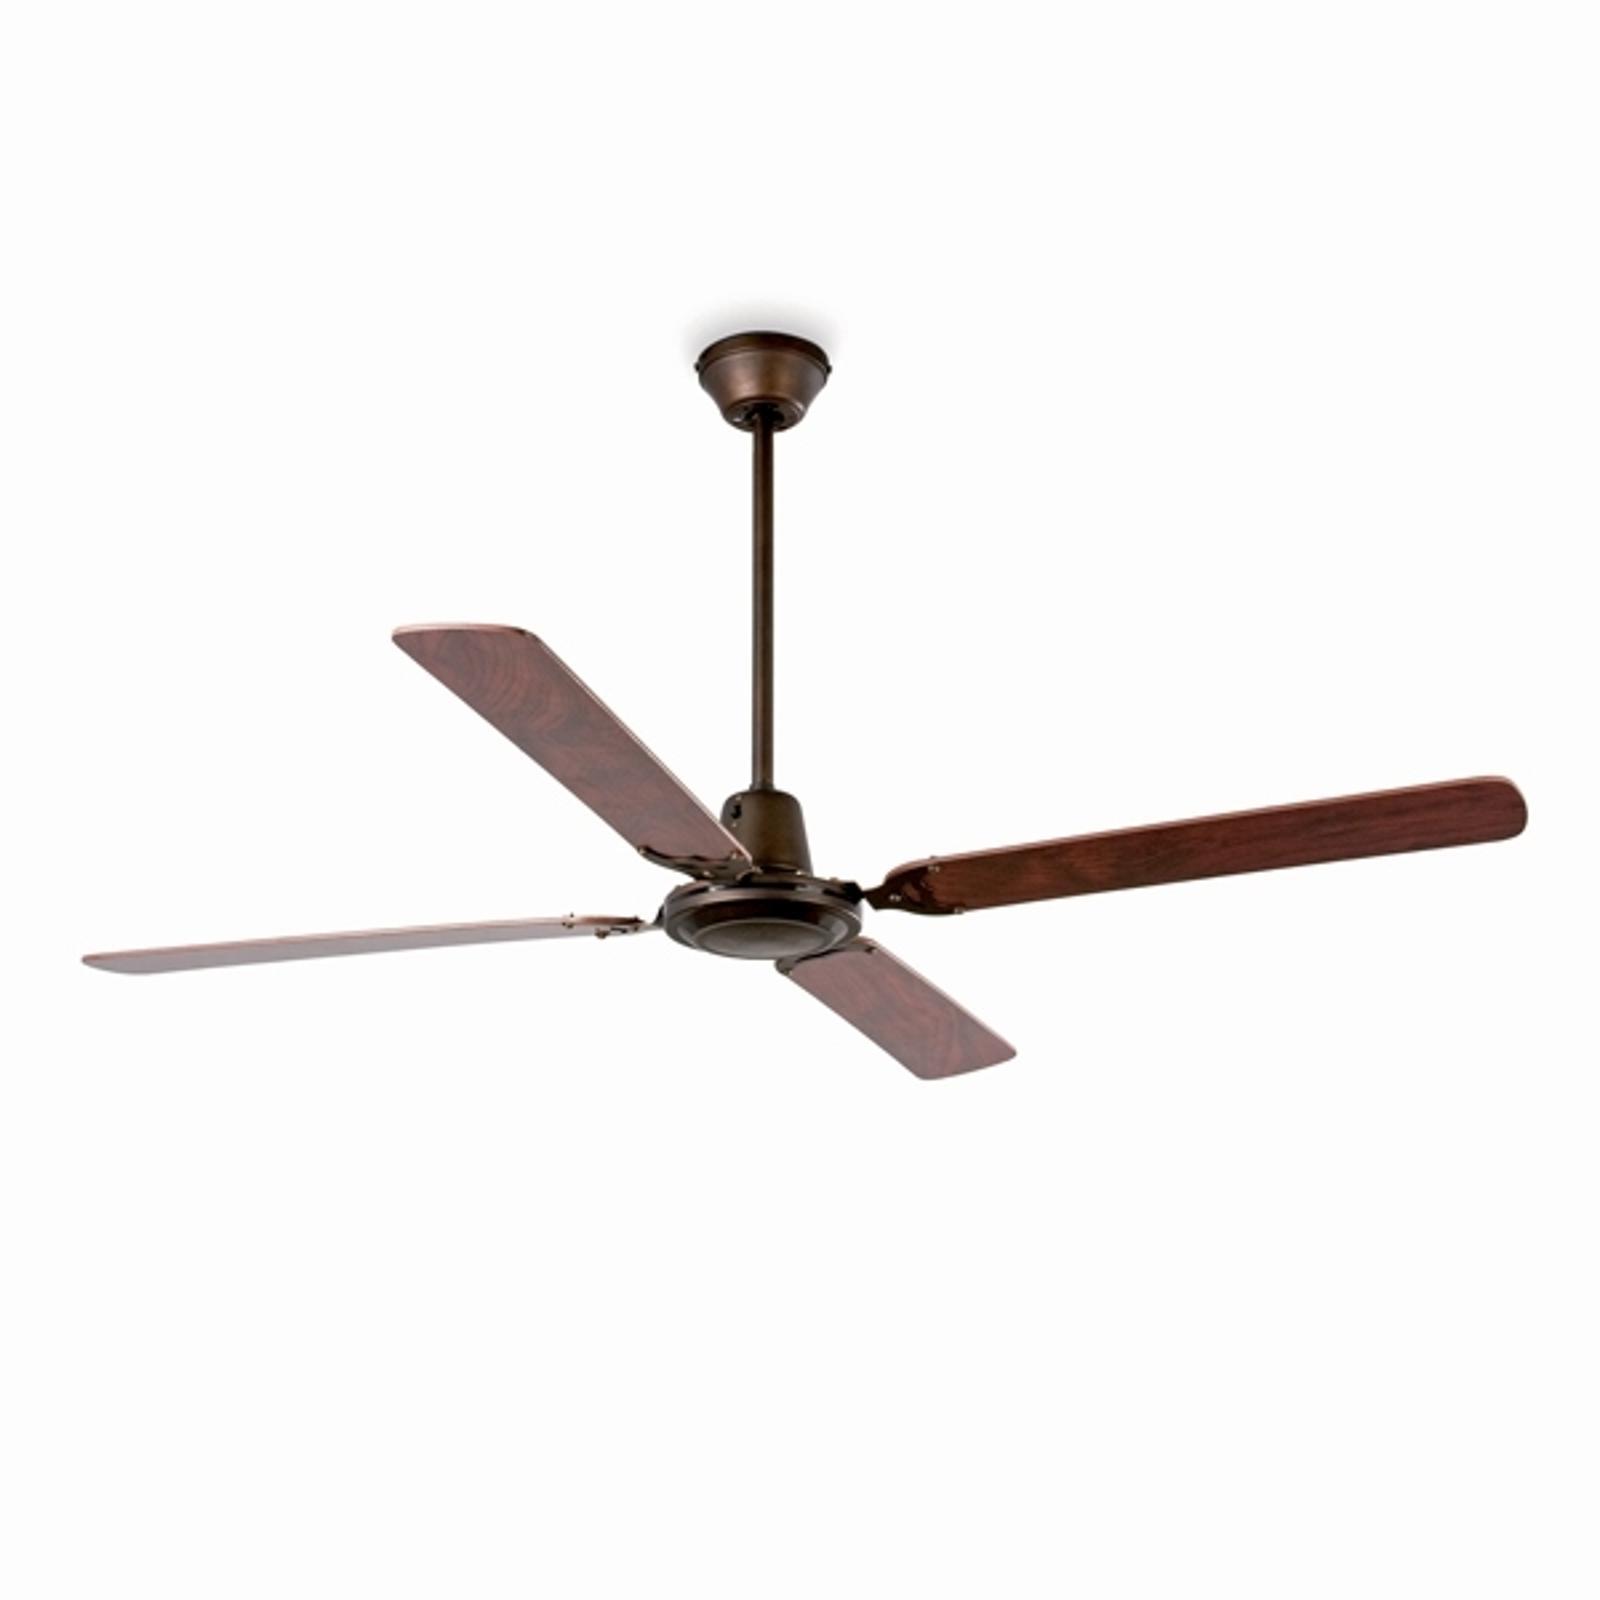 Ventilateur de plafond moderne MALVINAS, marron